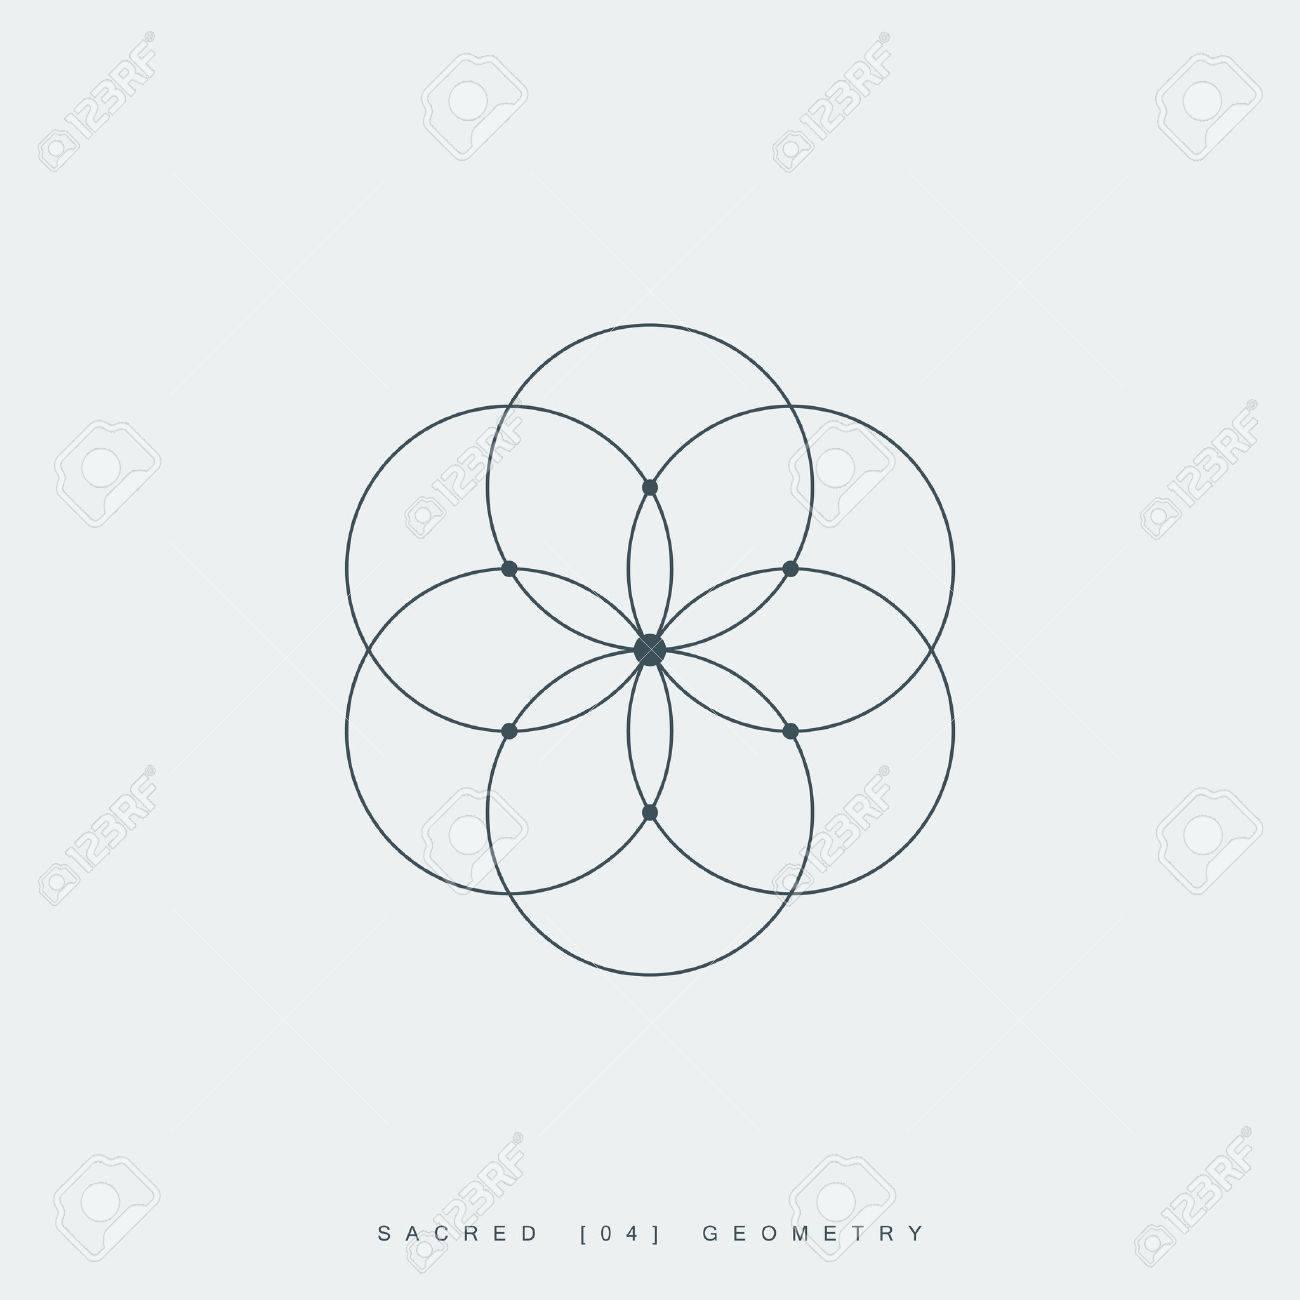 Flower of life sacred geometry lotus flower mandala ornament flower of life sacred geometry lotus flower mandala ornament esoteric or spiritual izmirmasajfo